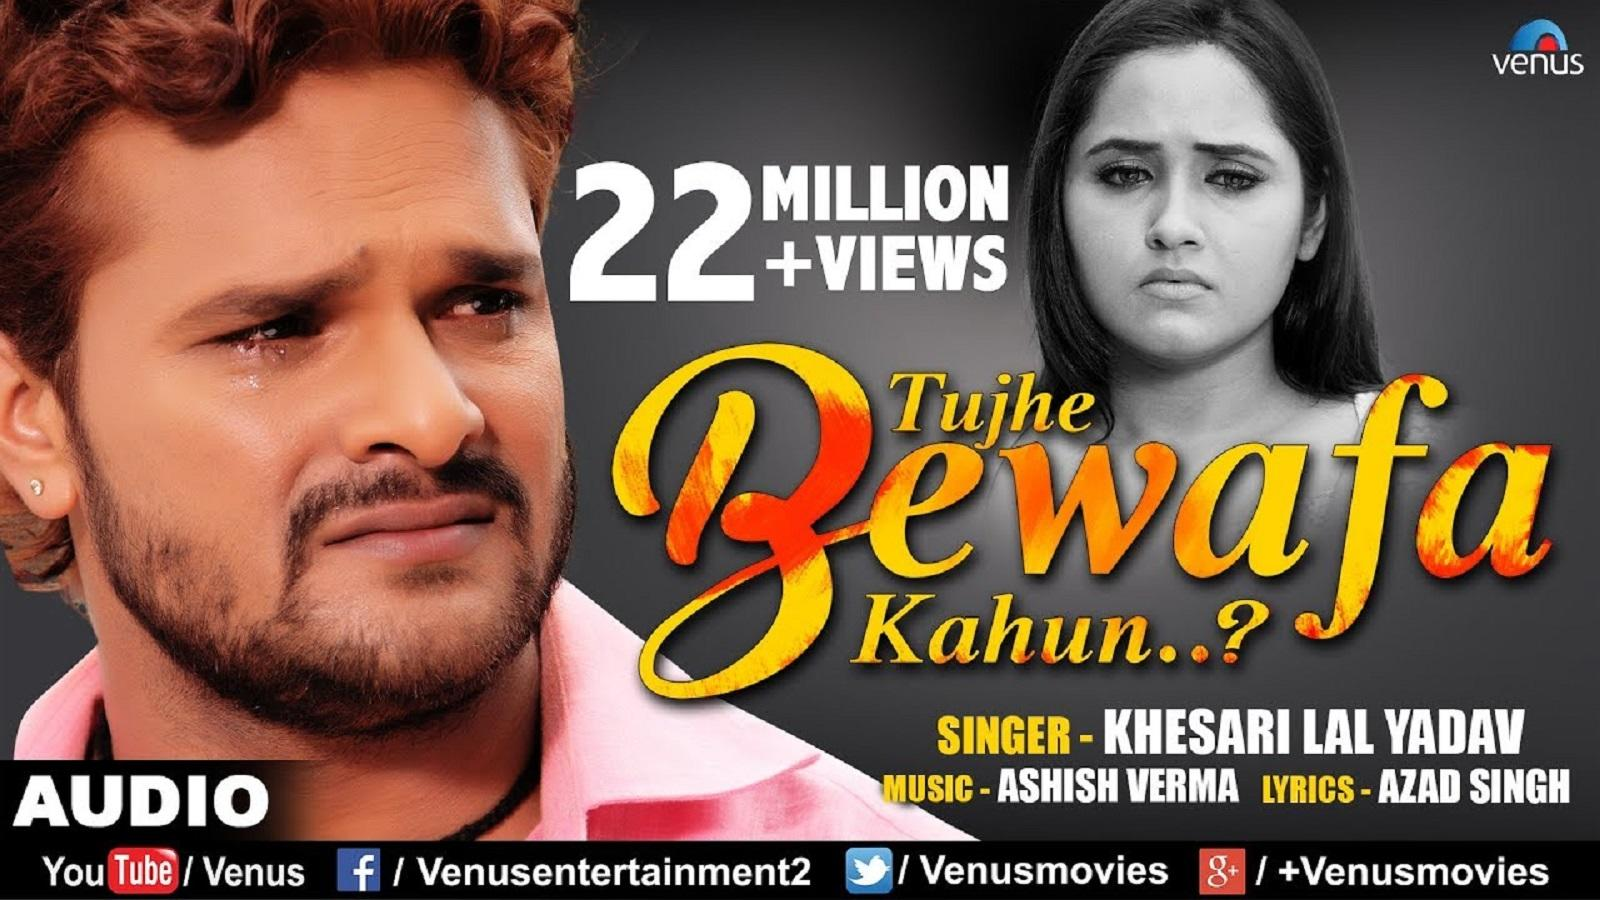 Watch: Khesari Lal Yadav and Ashish Verma's hit Hindi sad song 'Tujhe  Bewafa Kahun'